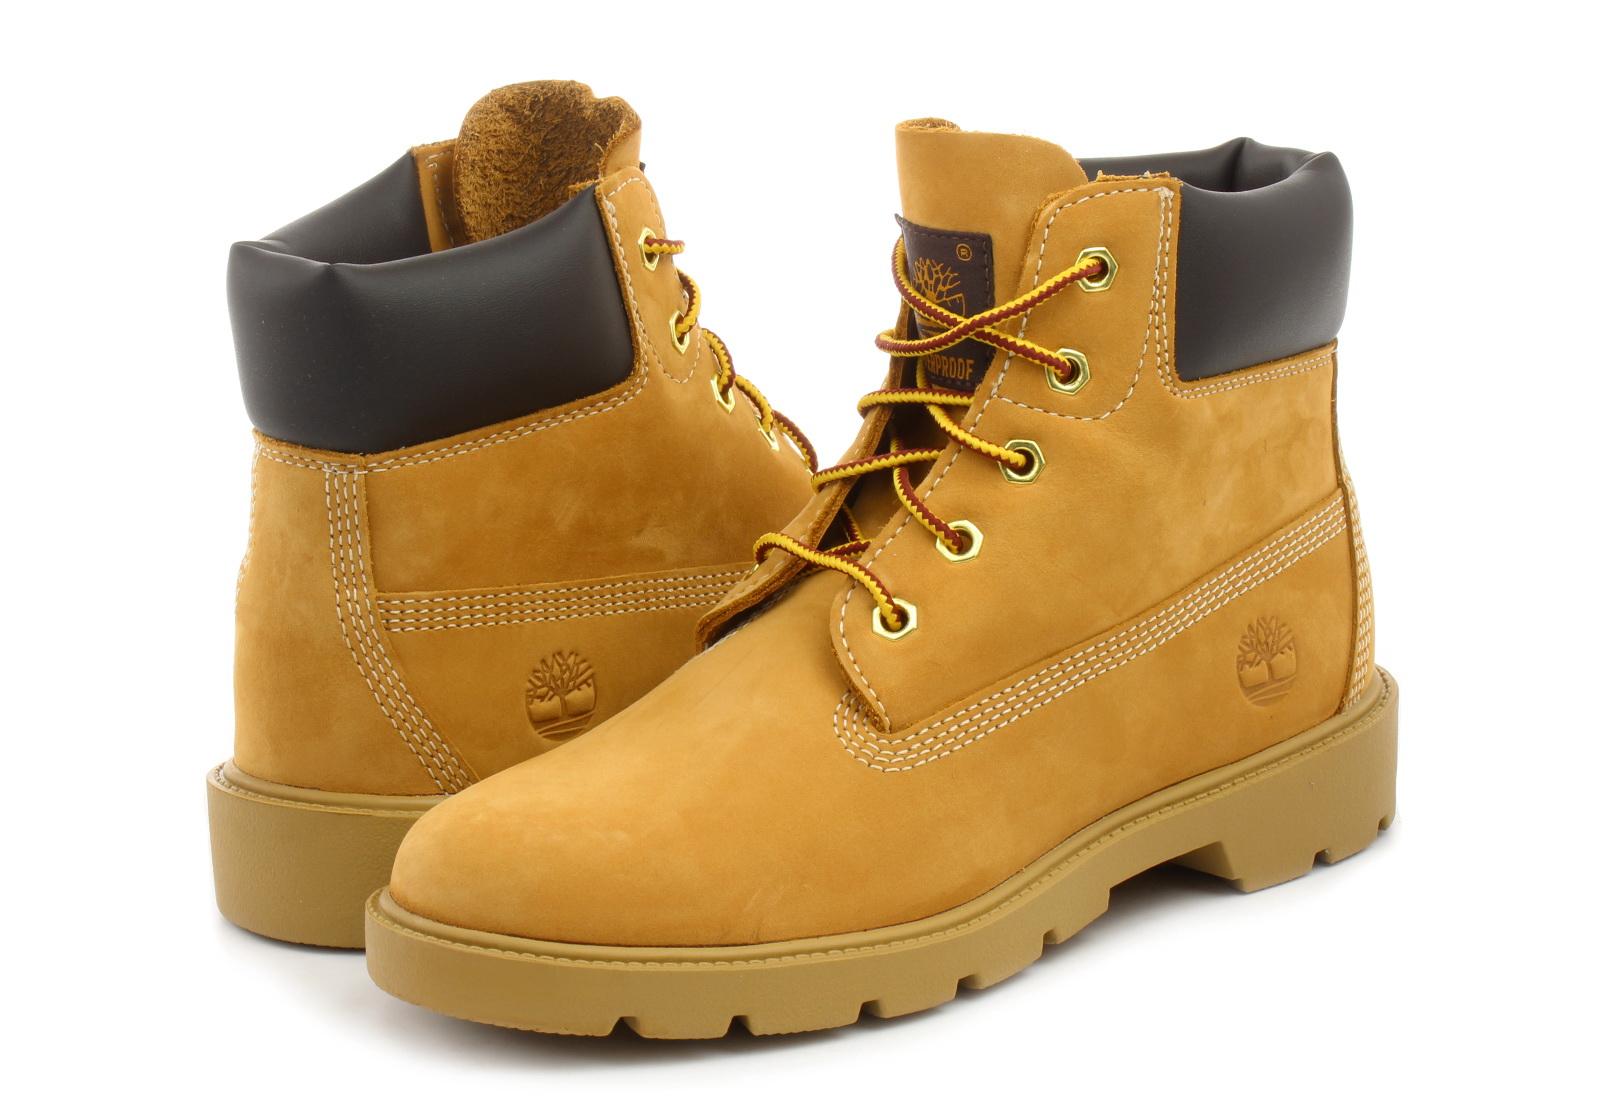 Timberland Bakancs 6 Inch Boot